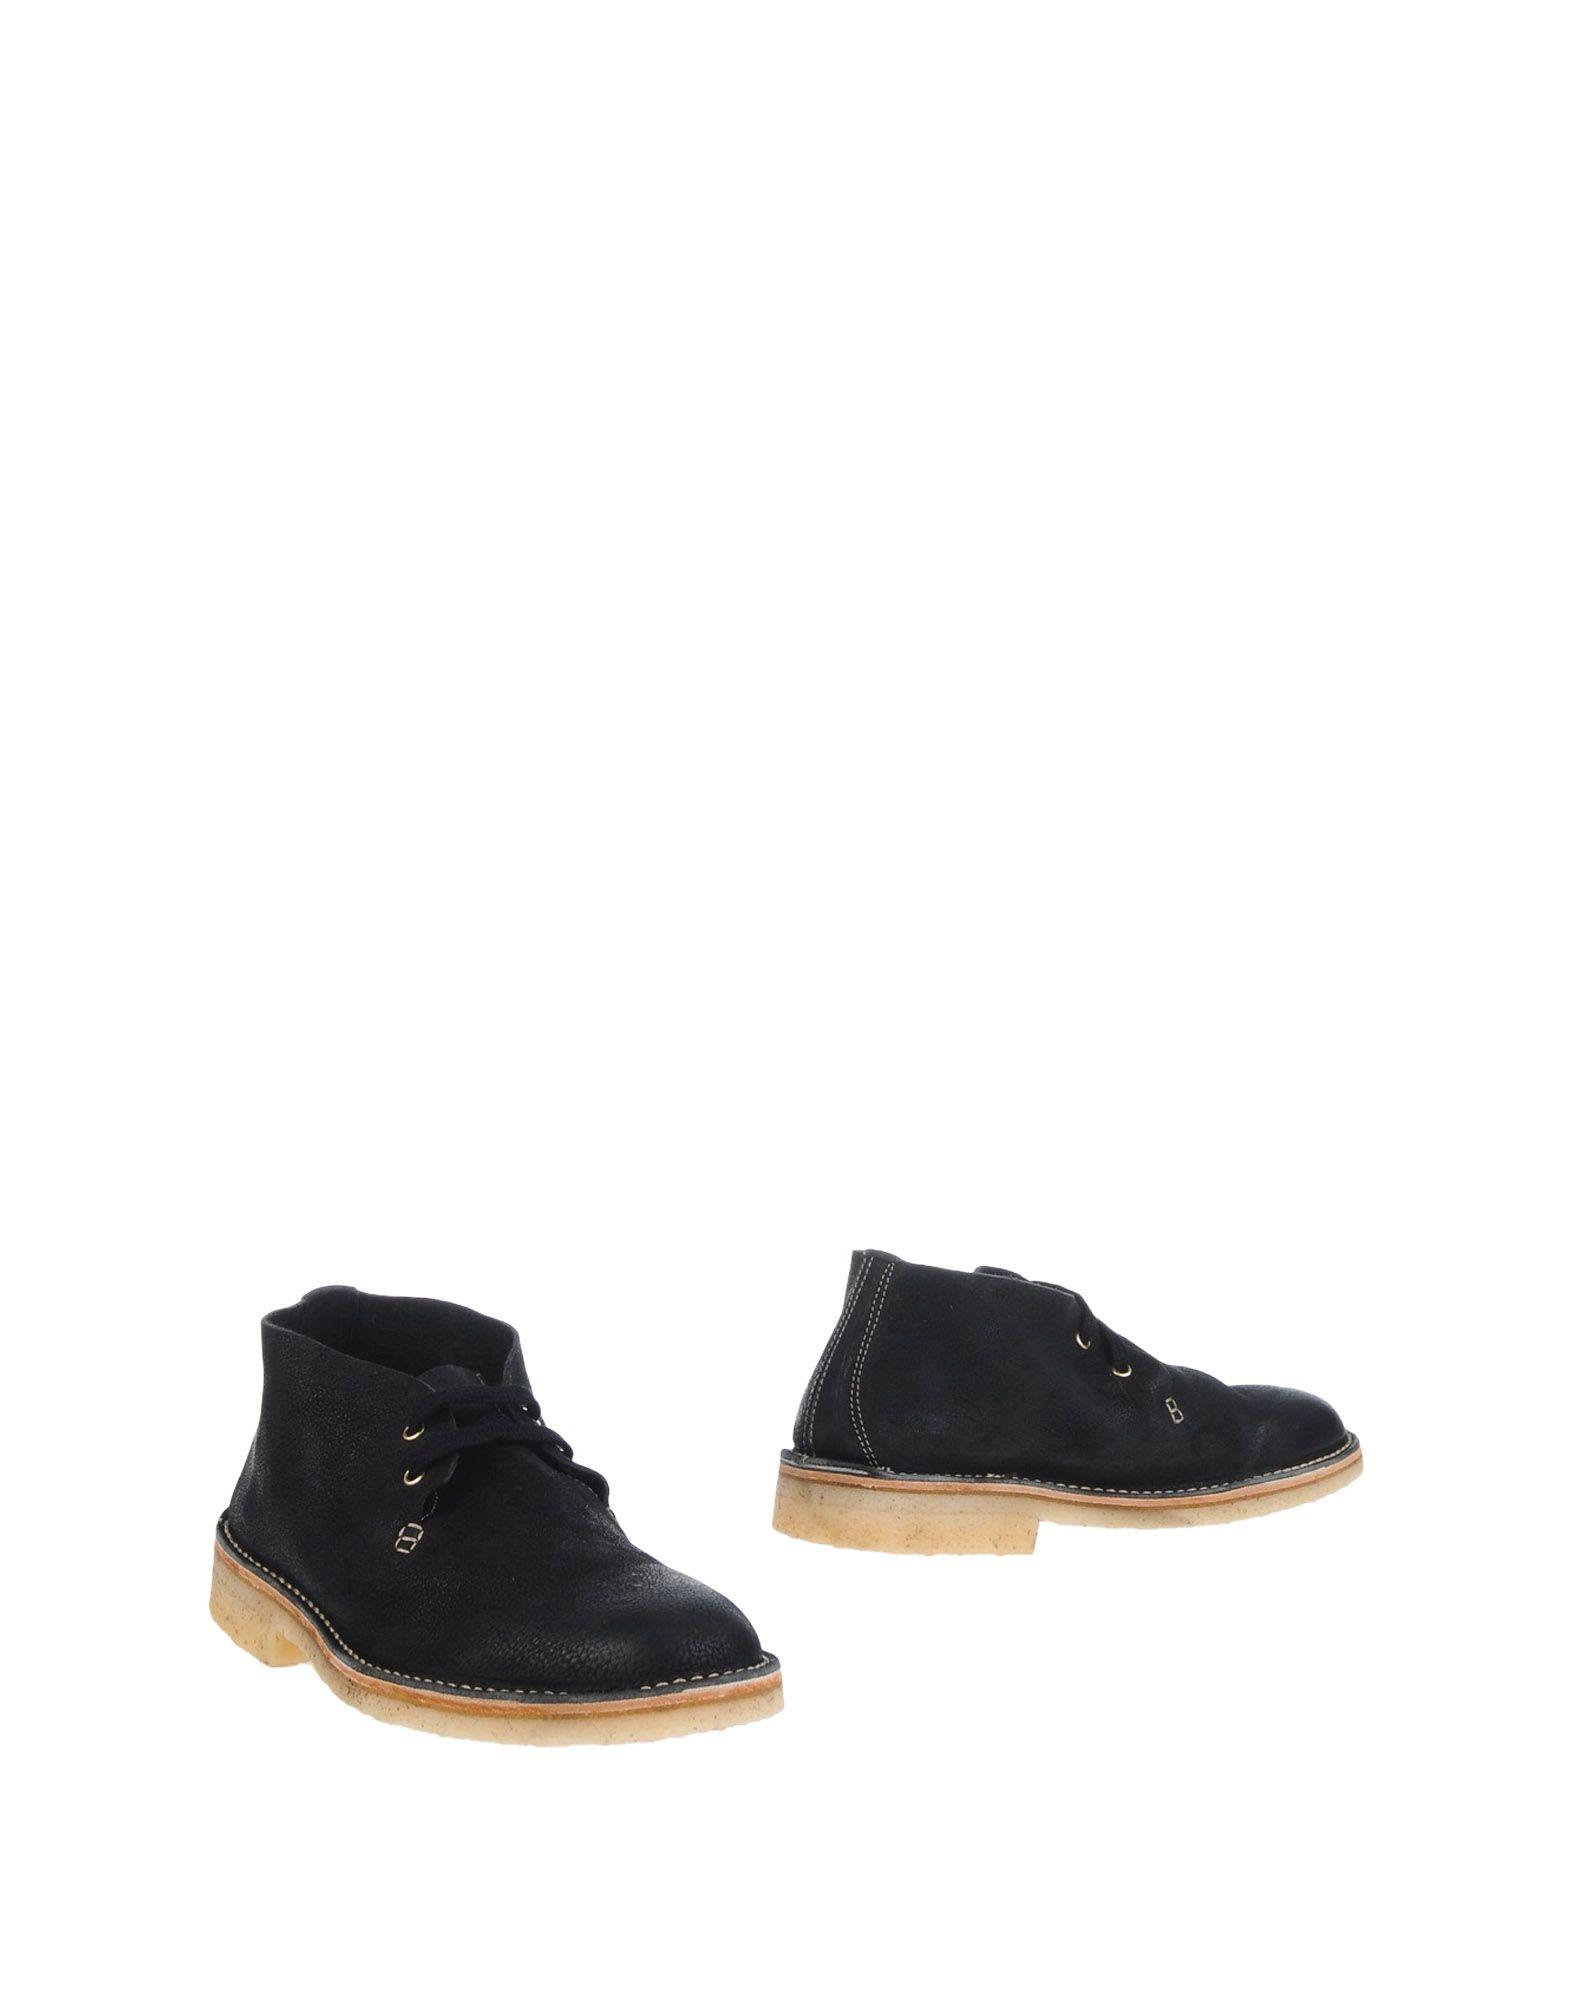 Rabatt echte Schuhe N.D.C. Made By Hand Stiefelette Herren  11197691EK